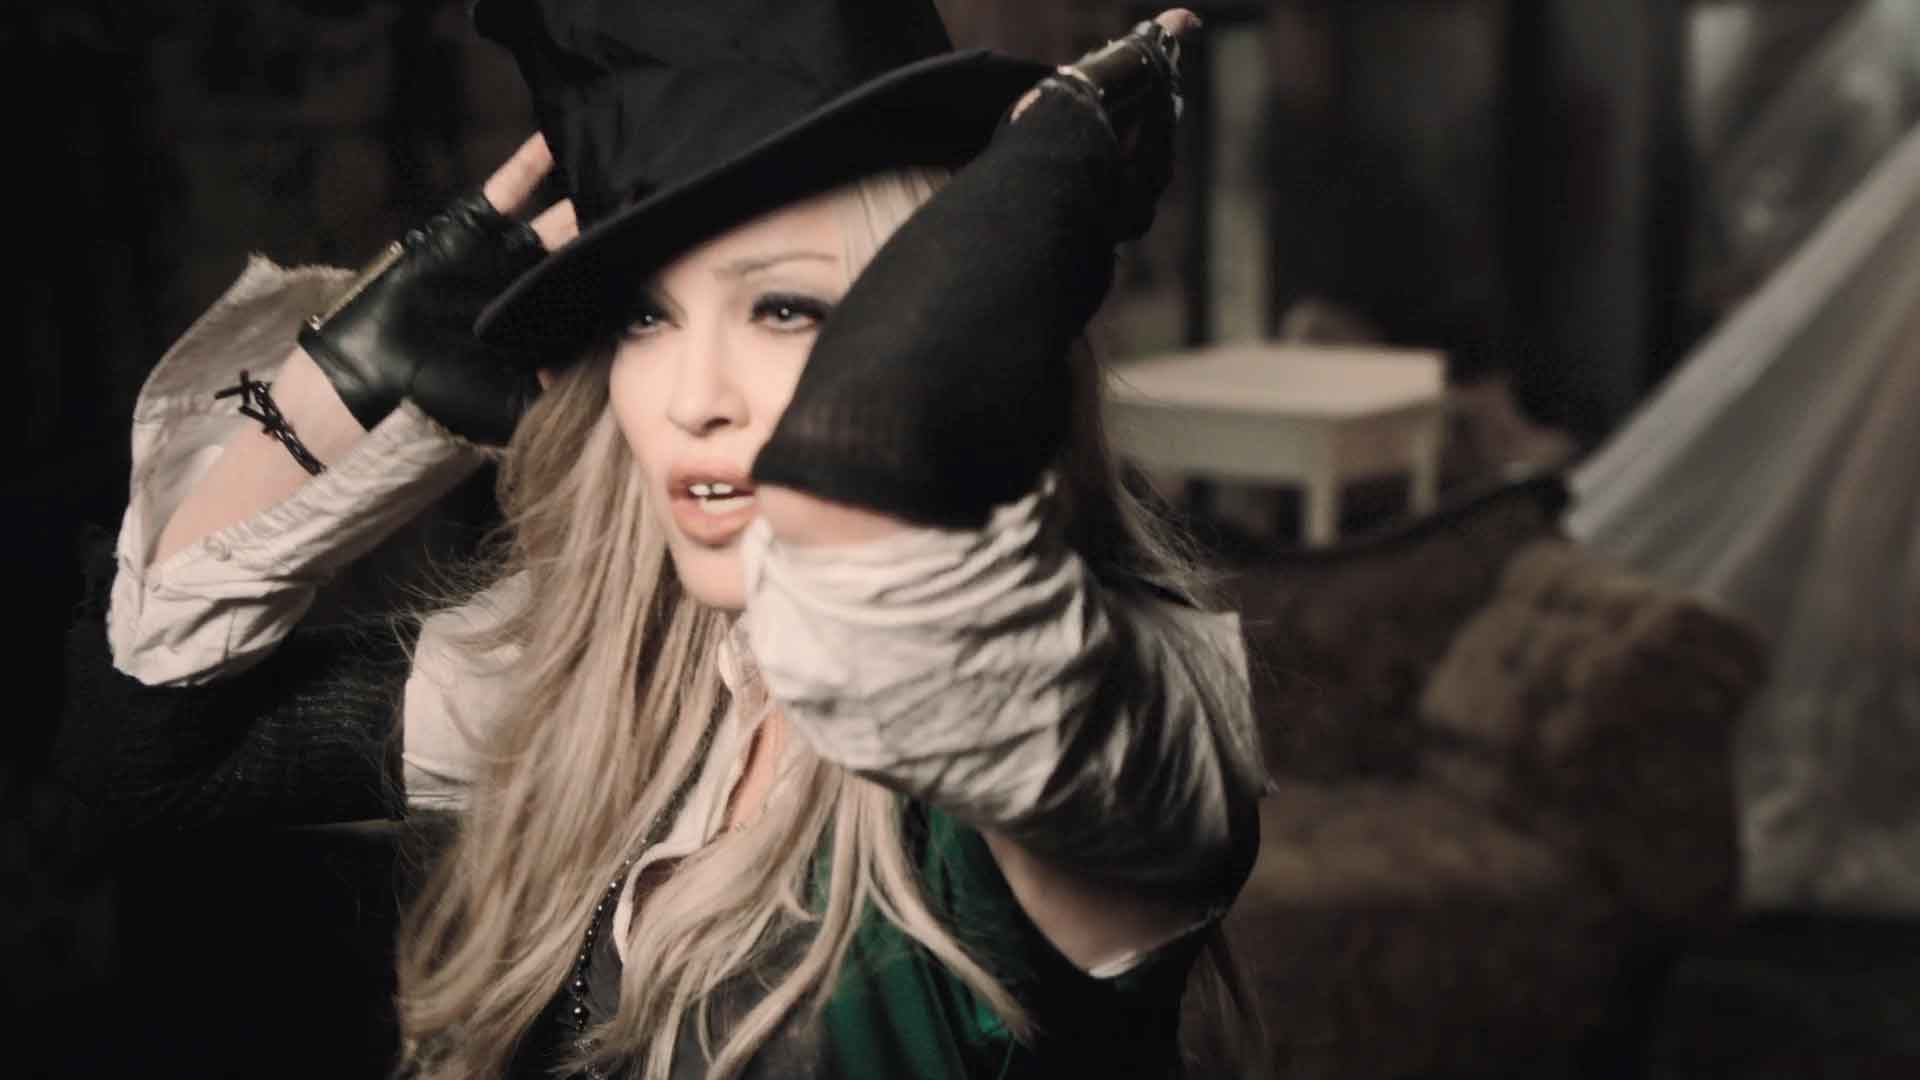 [1080P] Madonna - Ghosttown 高码版